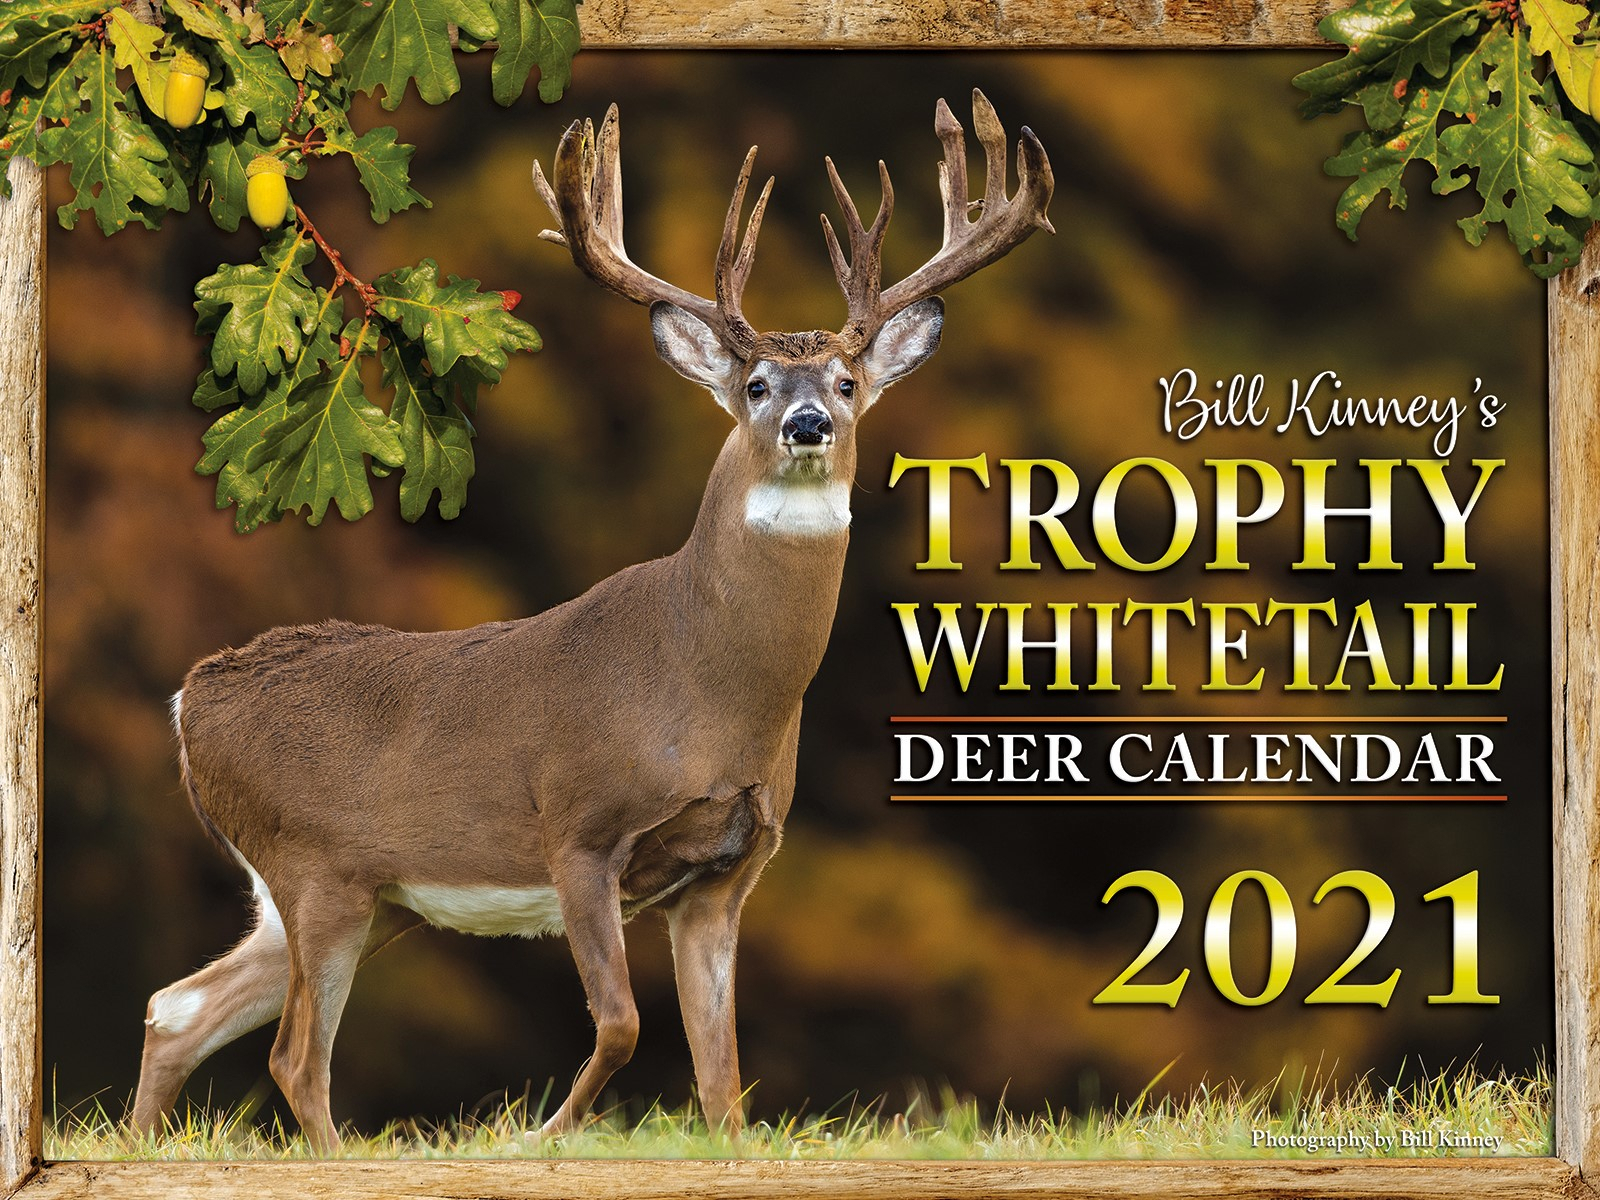 2021 Whitetail Rut Calendar | Calendar Printables Free Blank within 2021 Illinois Whitetail Rut Calendar